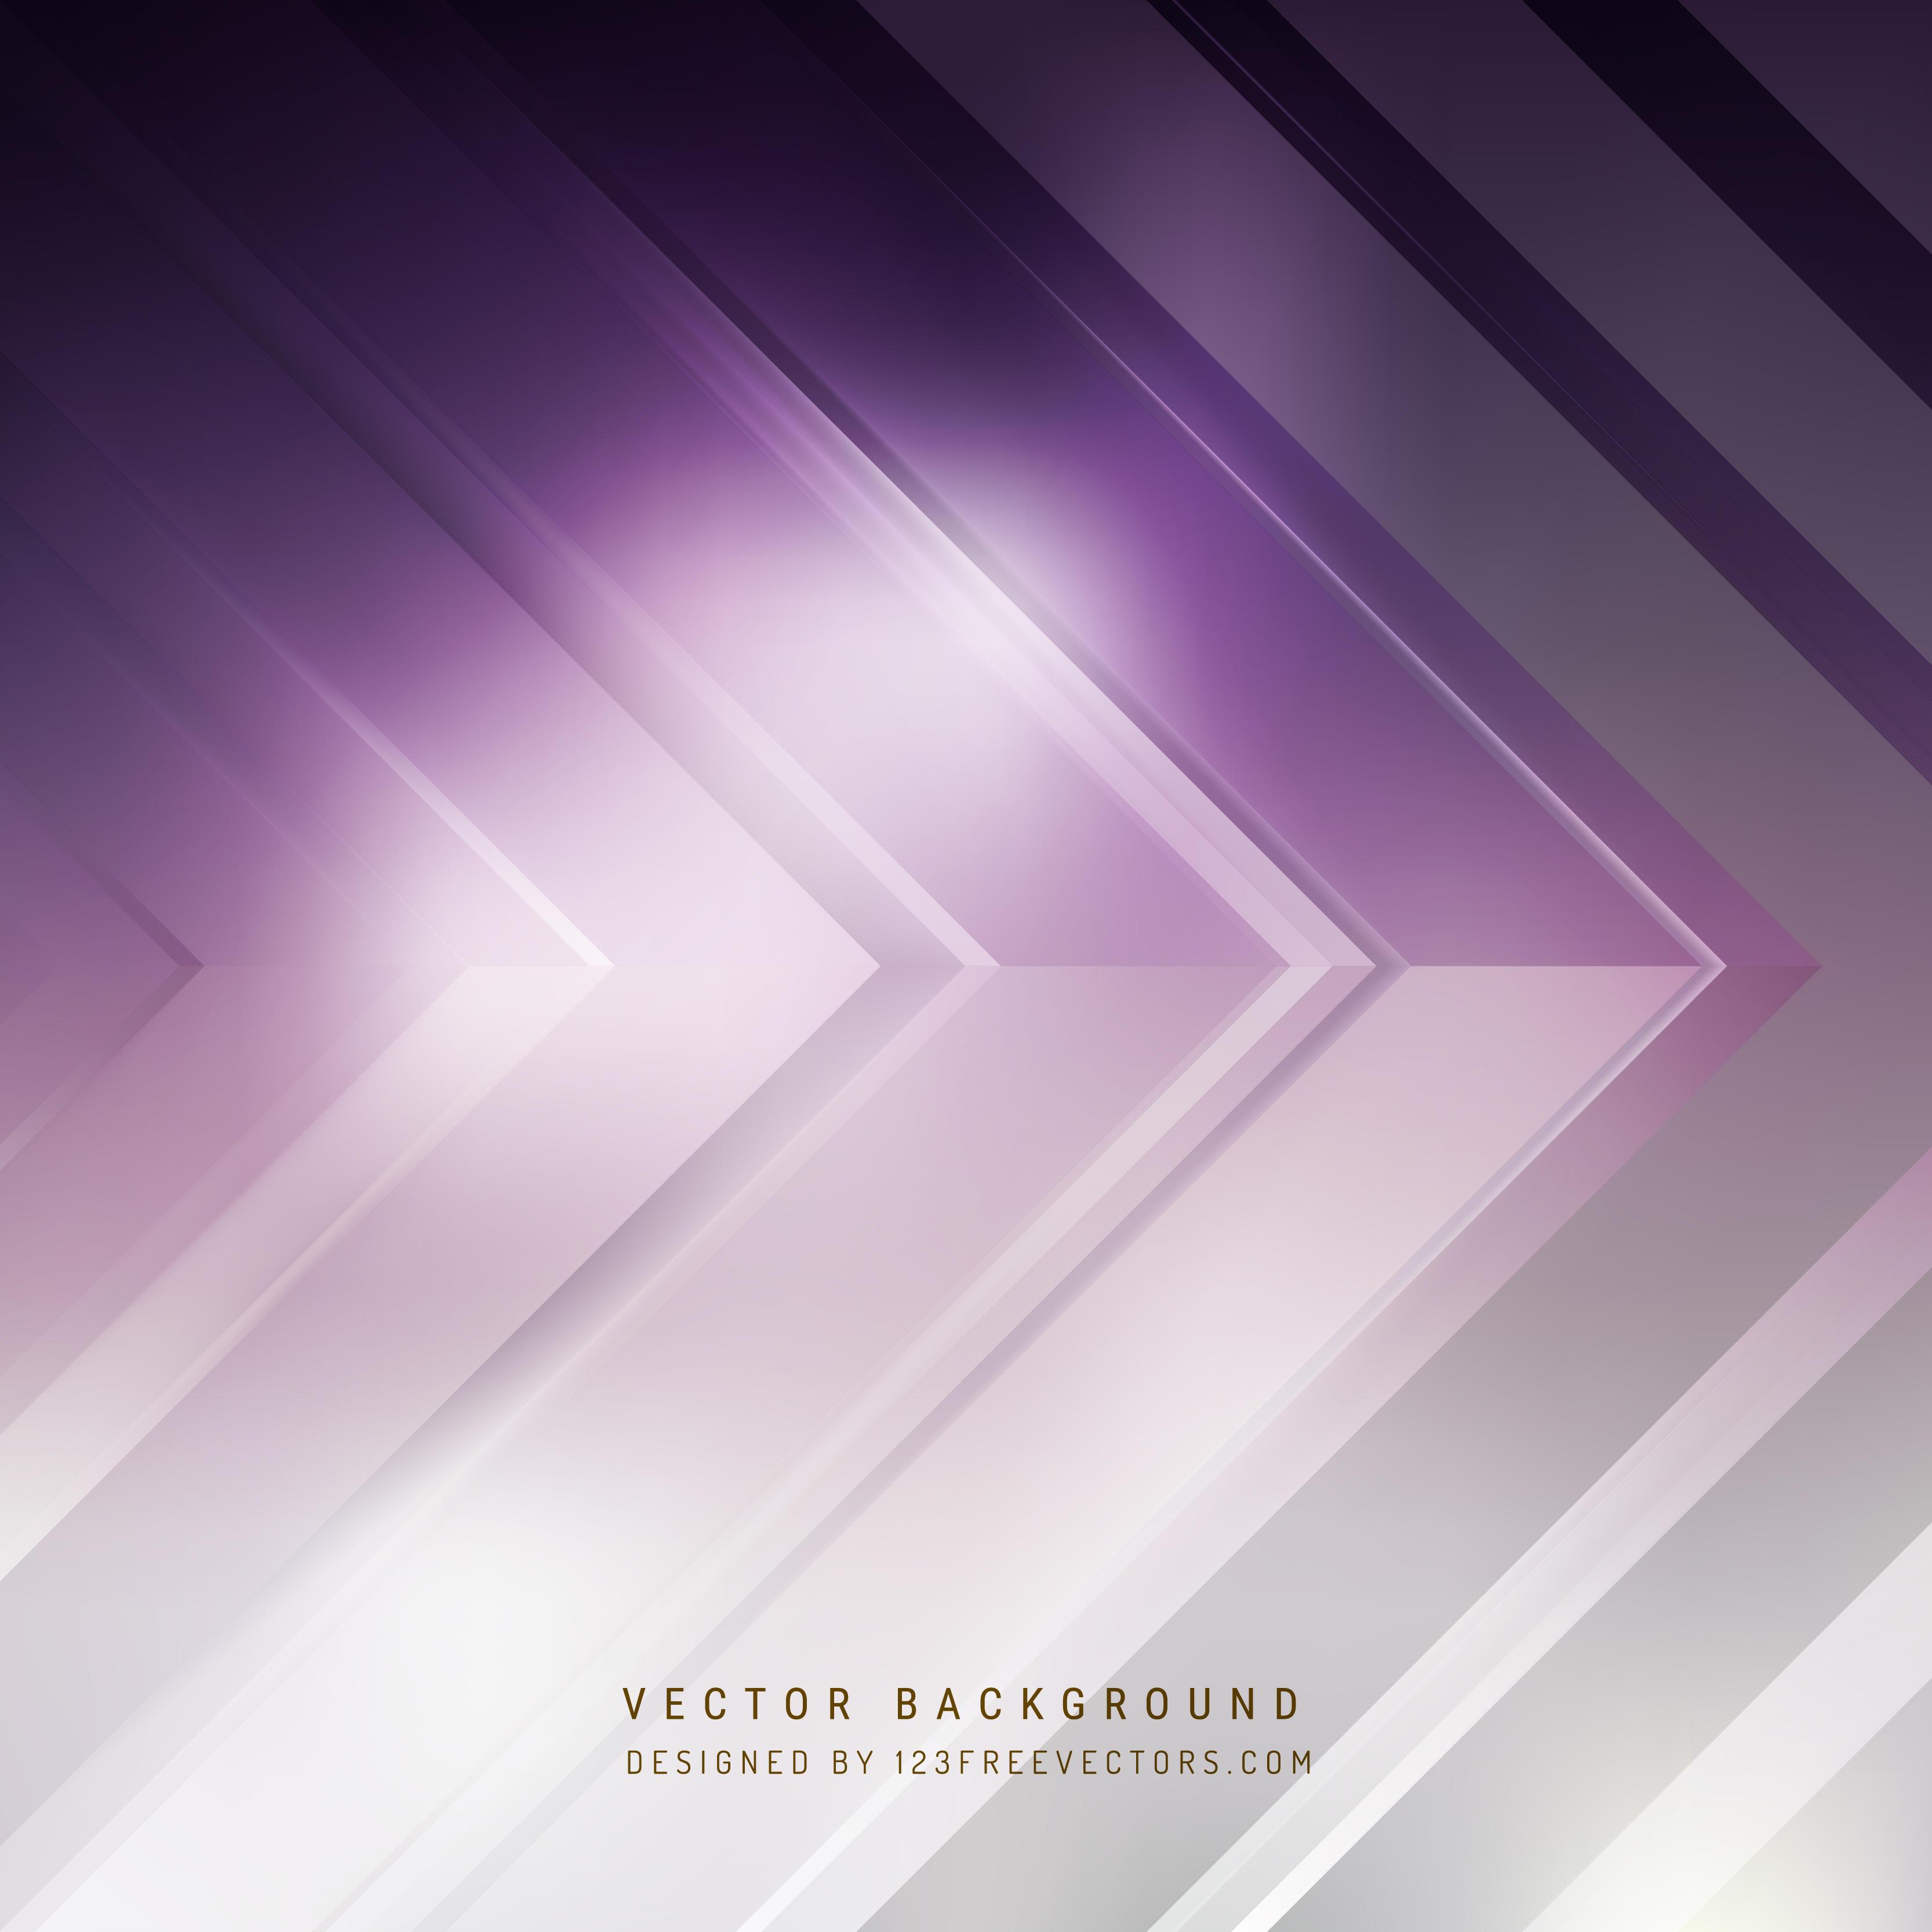 Purple Gray And White Bedroom: Purple Gray Arrow Background Design